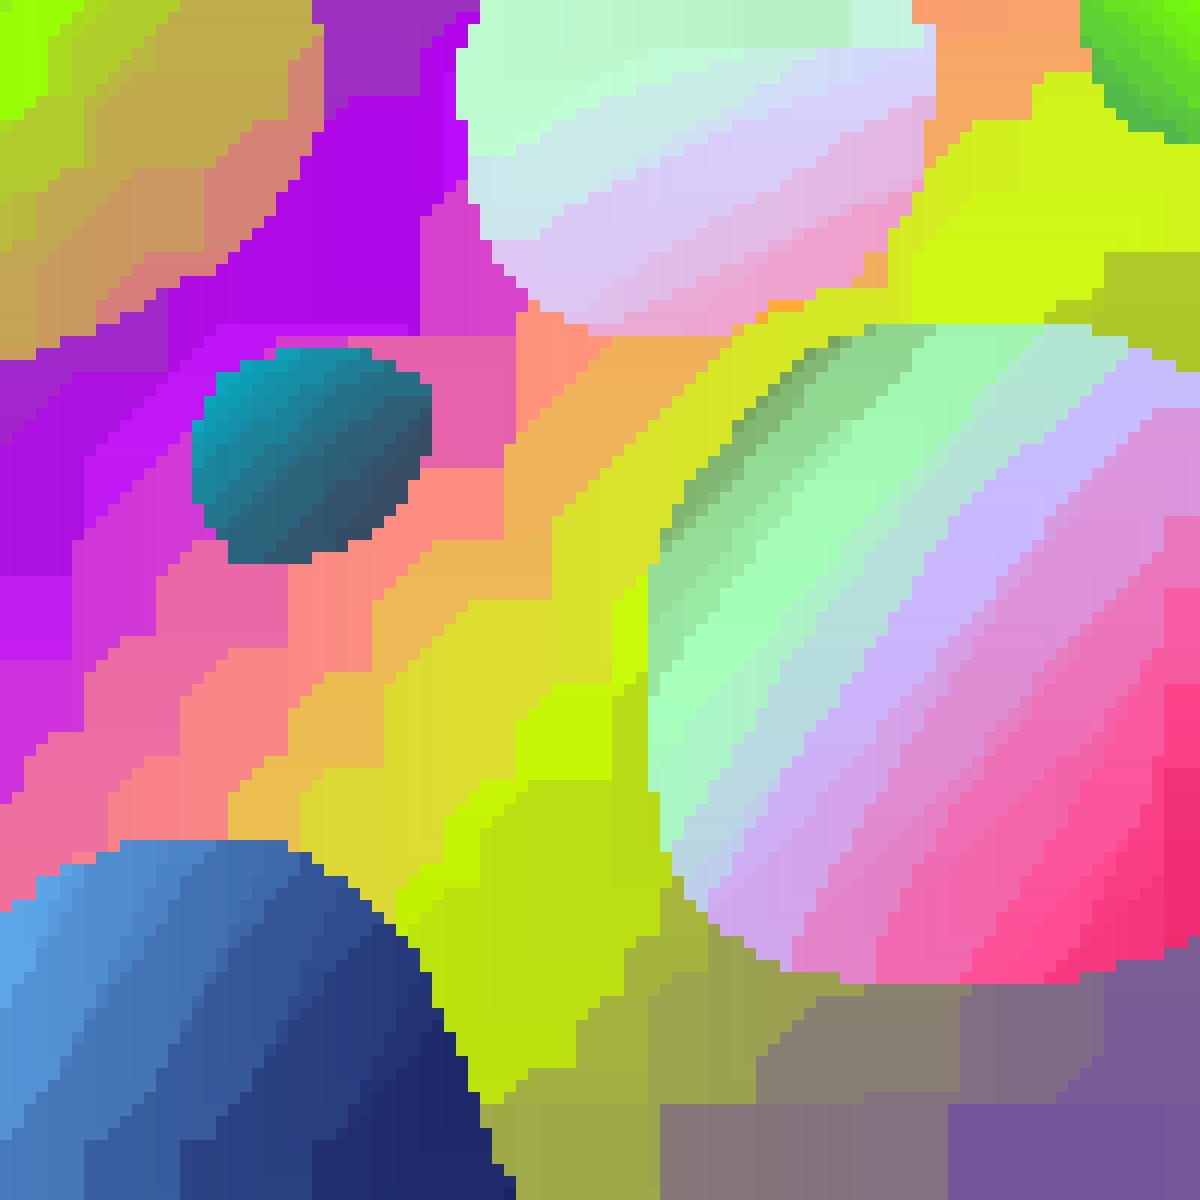 Hollow Rainbow by Uravity